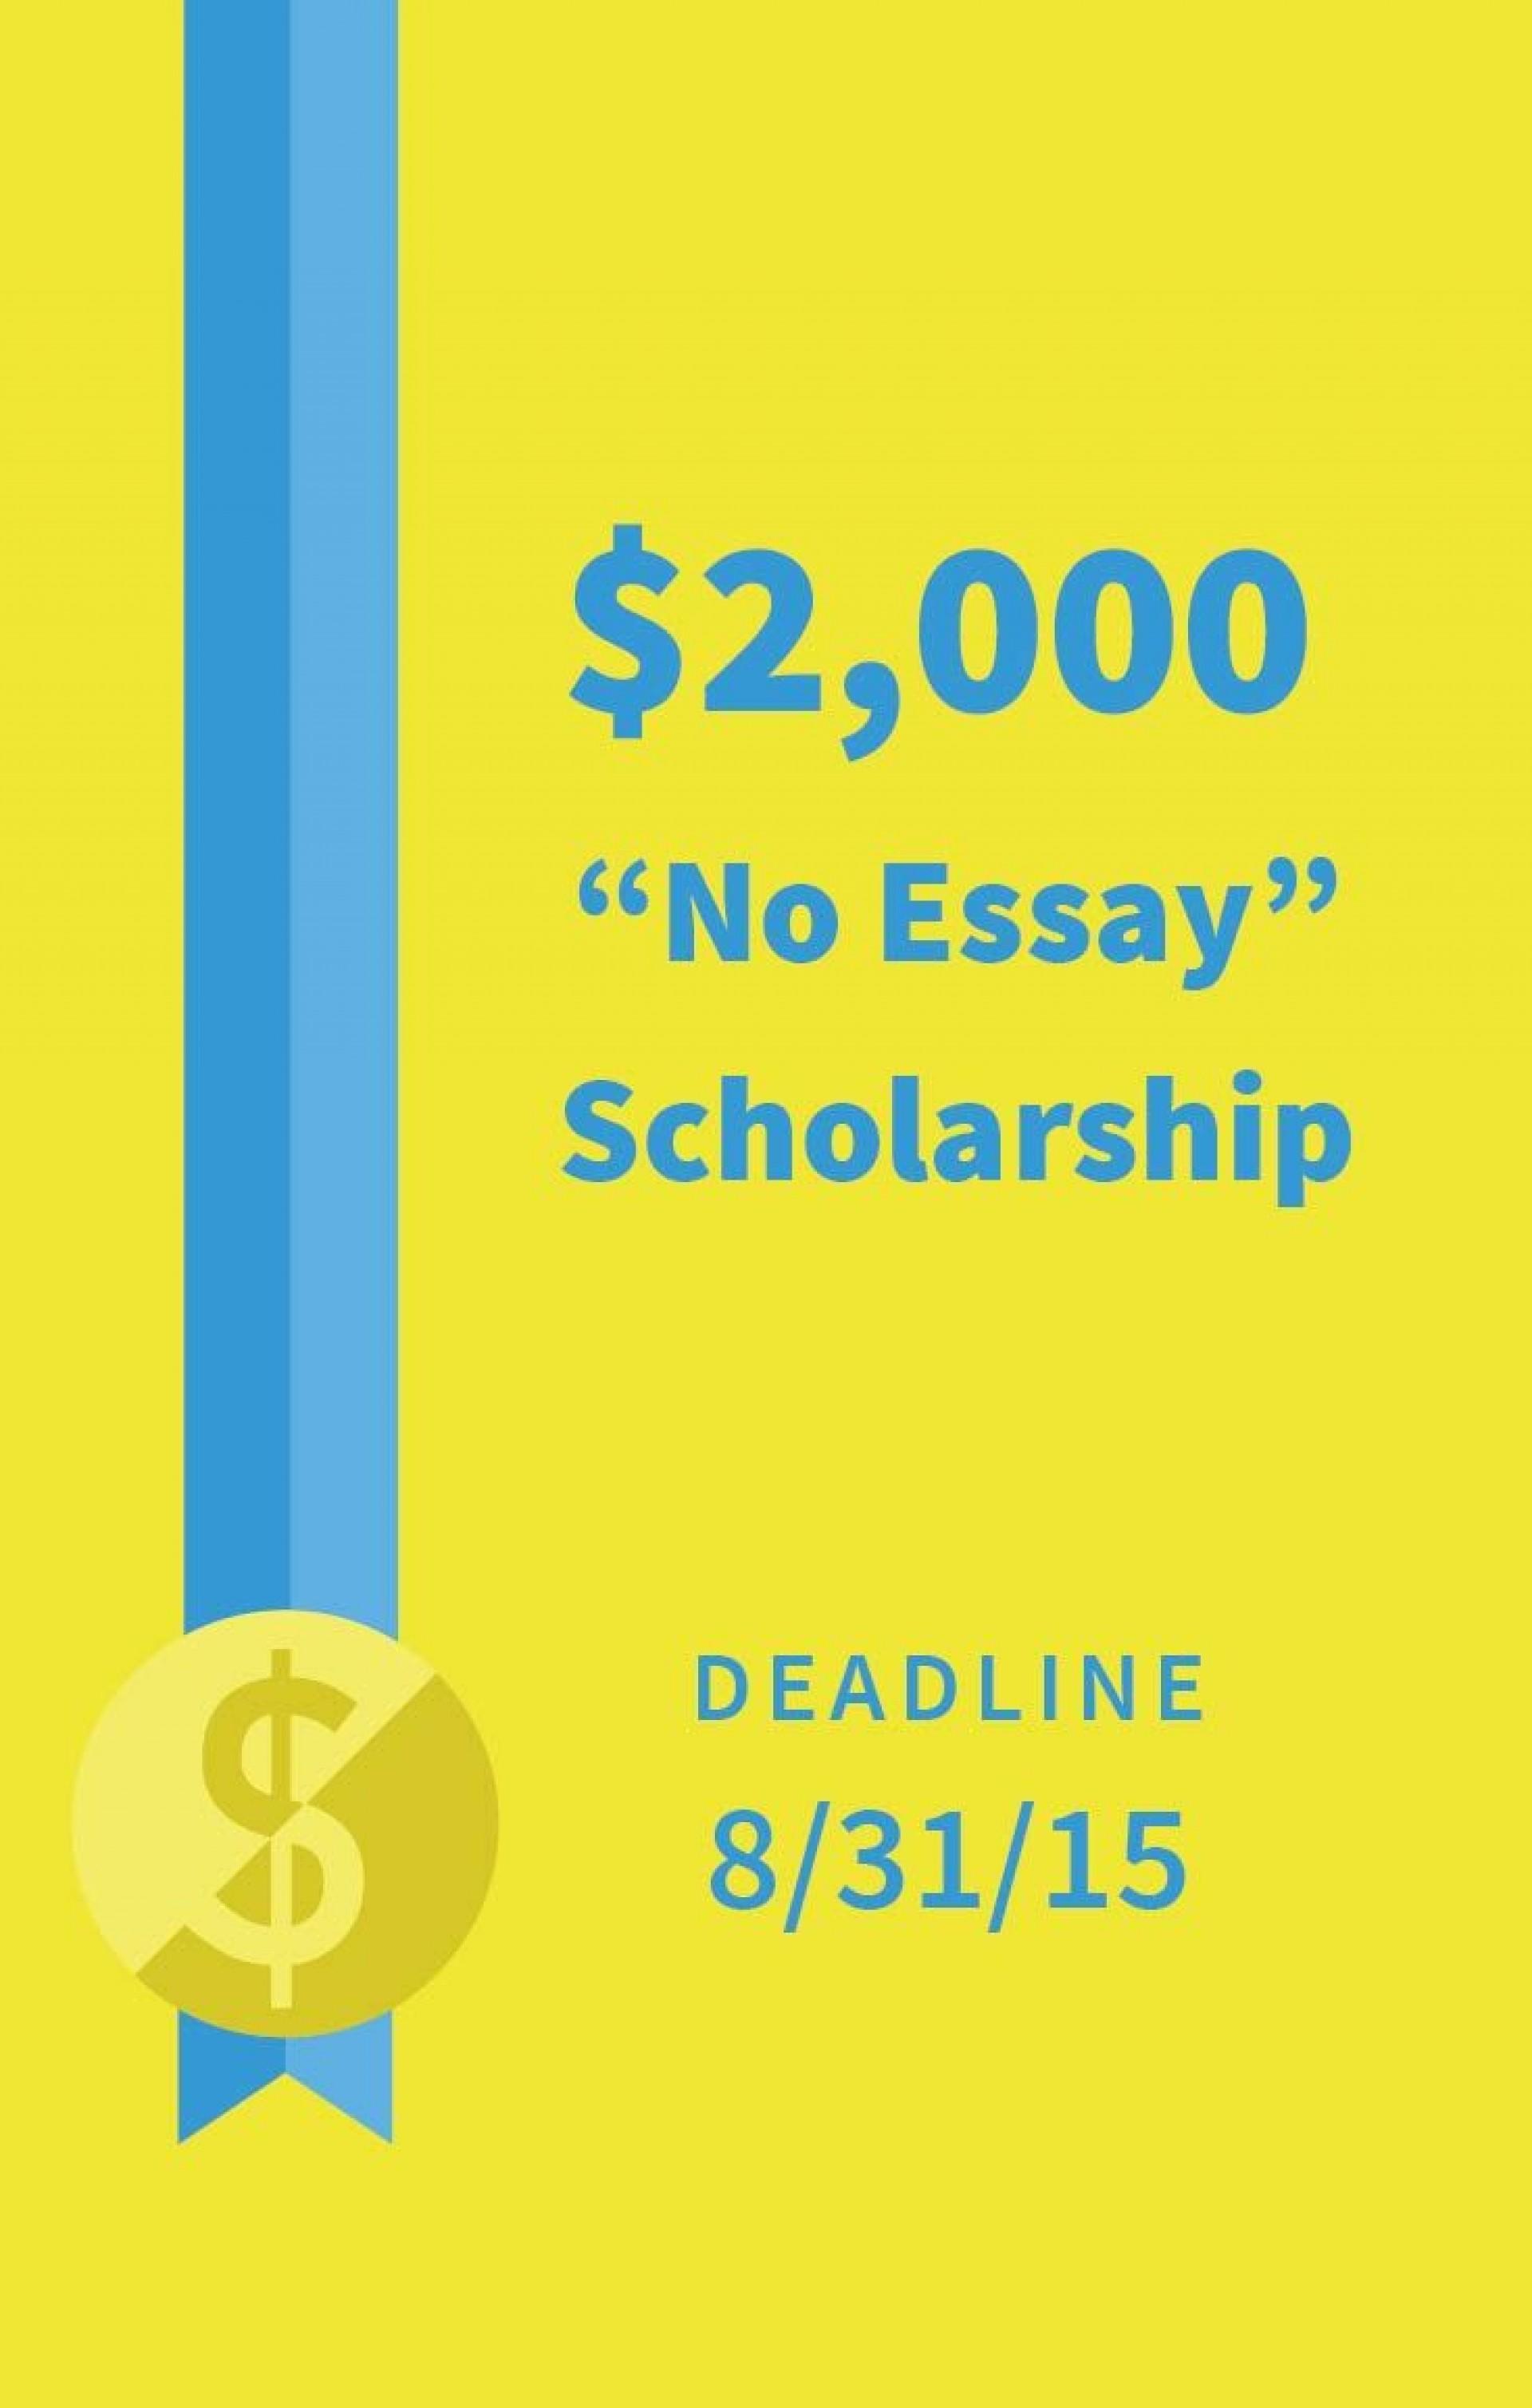 013 Niche No Essay Scholarship Marvelous Reddit Winners 1920